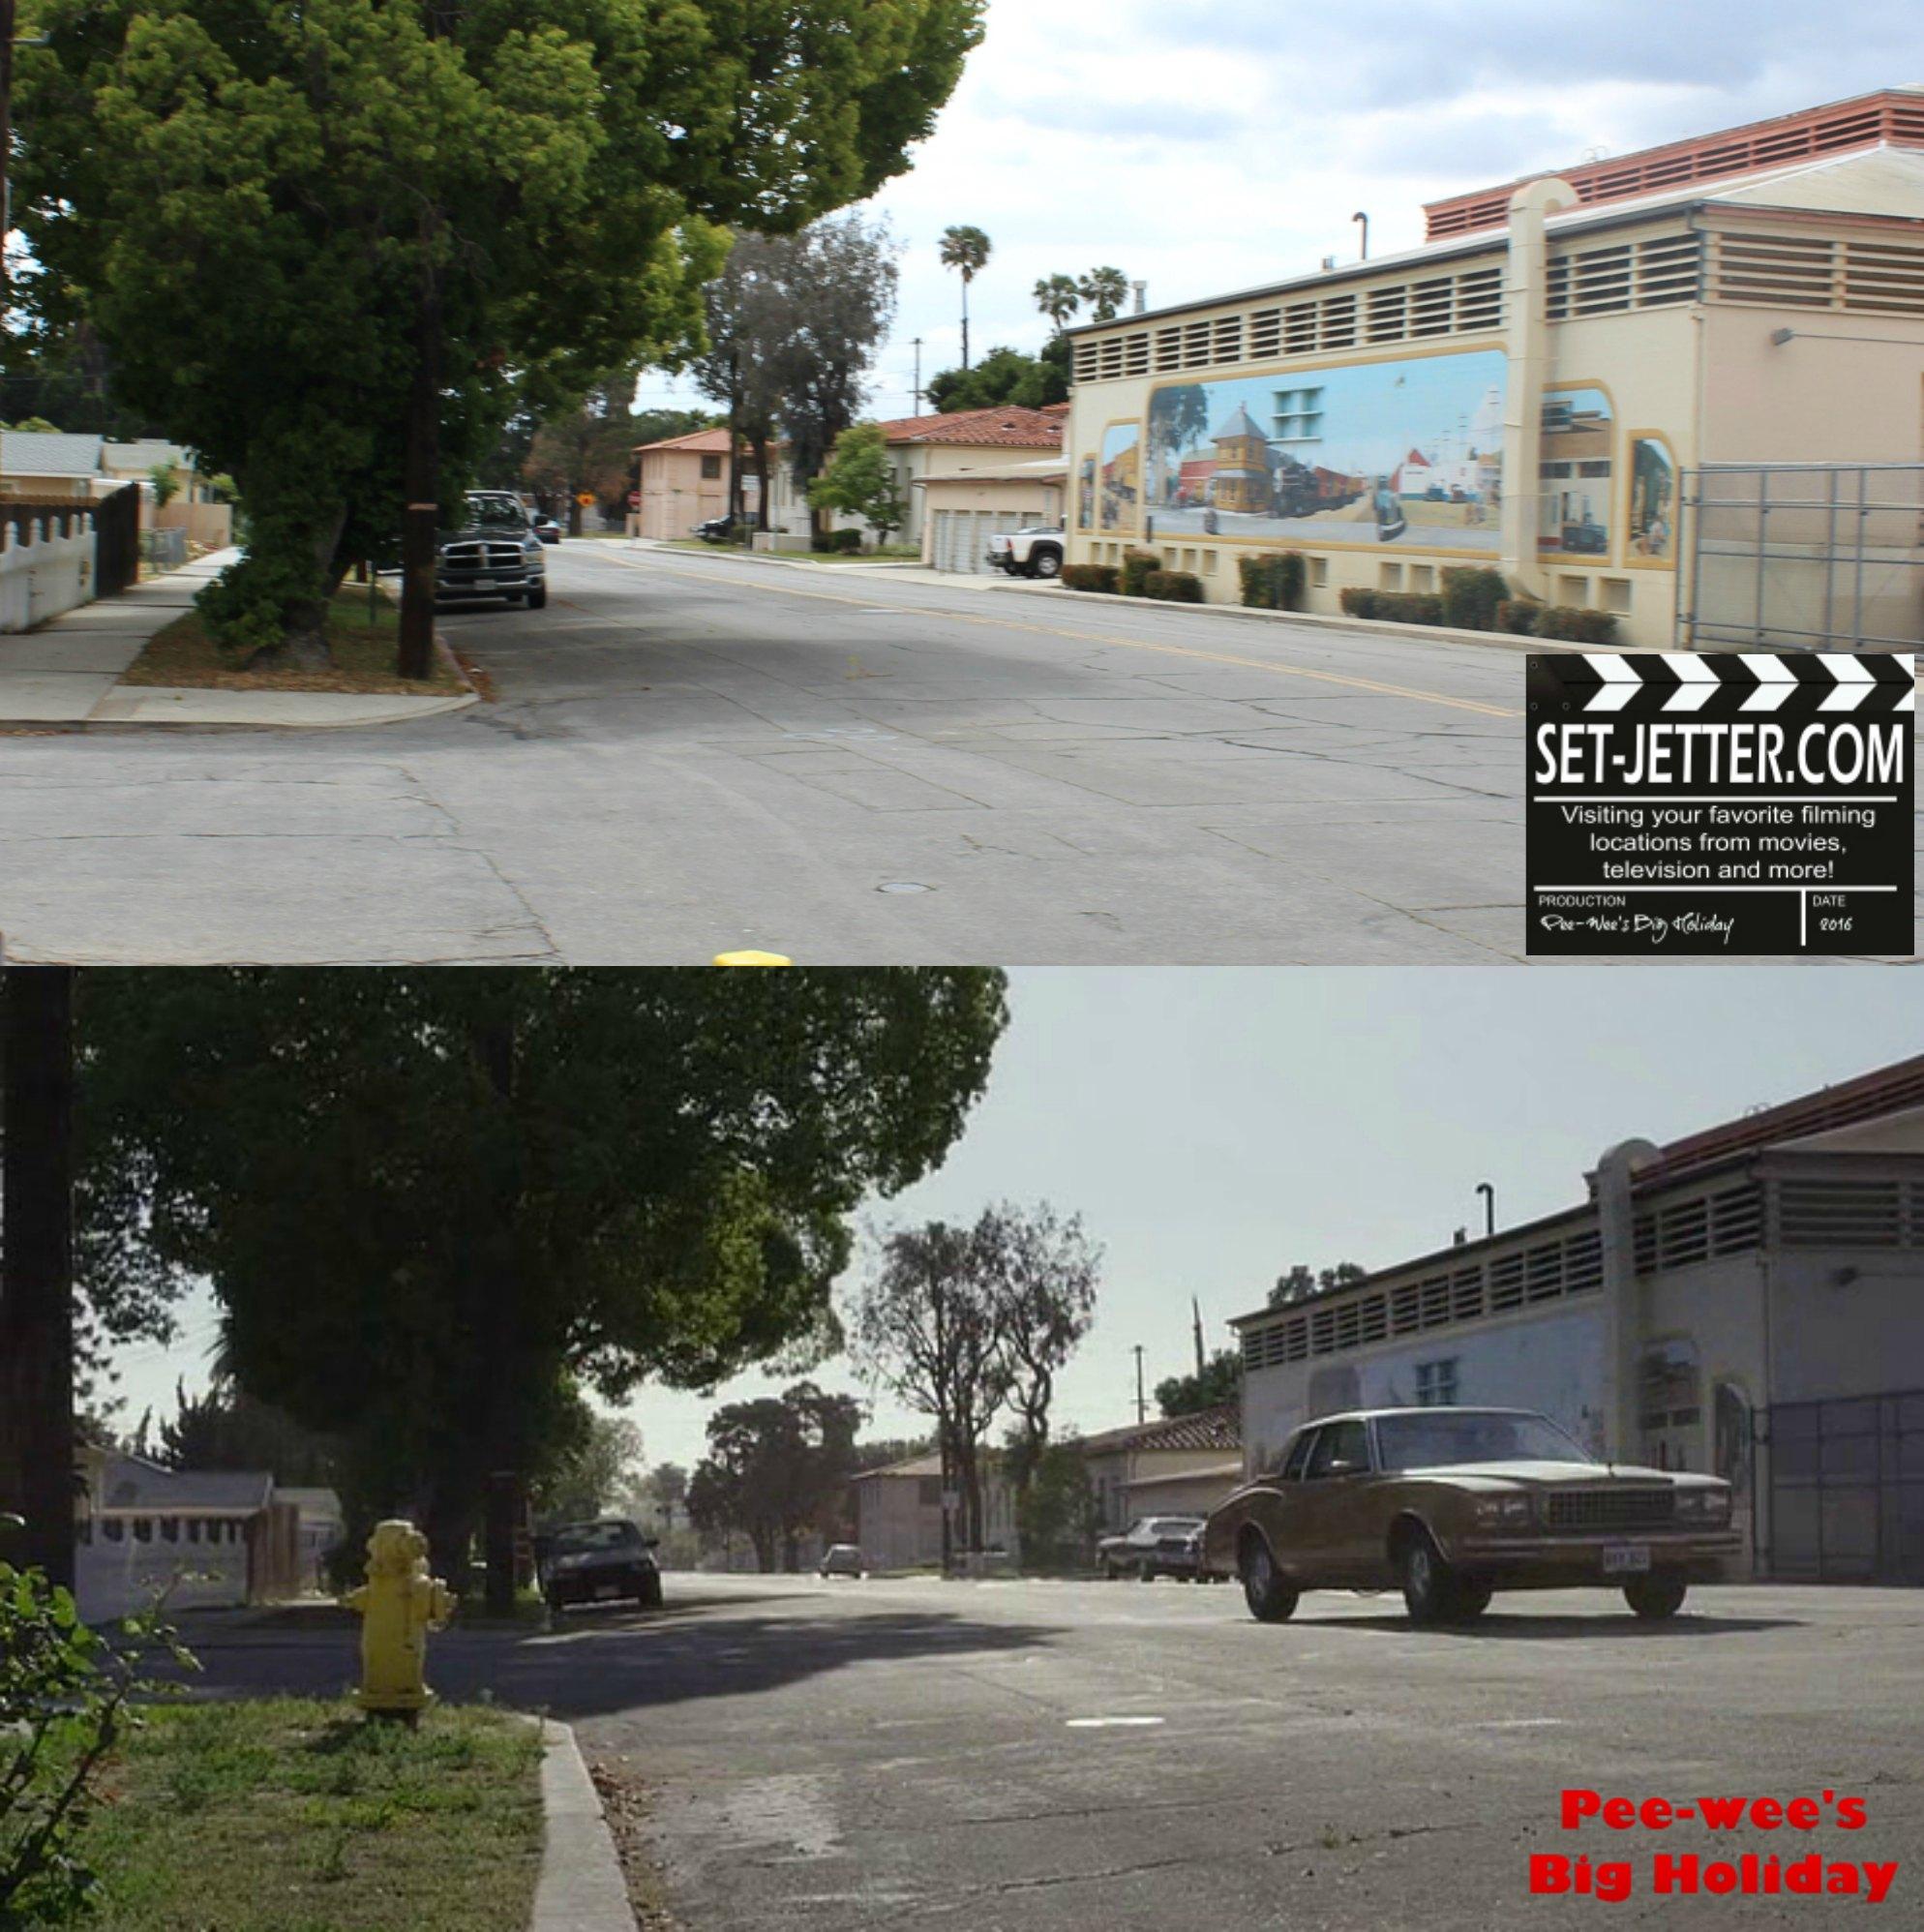 Pee Wee's Big Holiday comparison 362.jpg